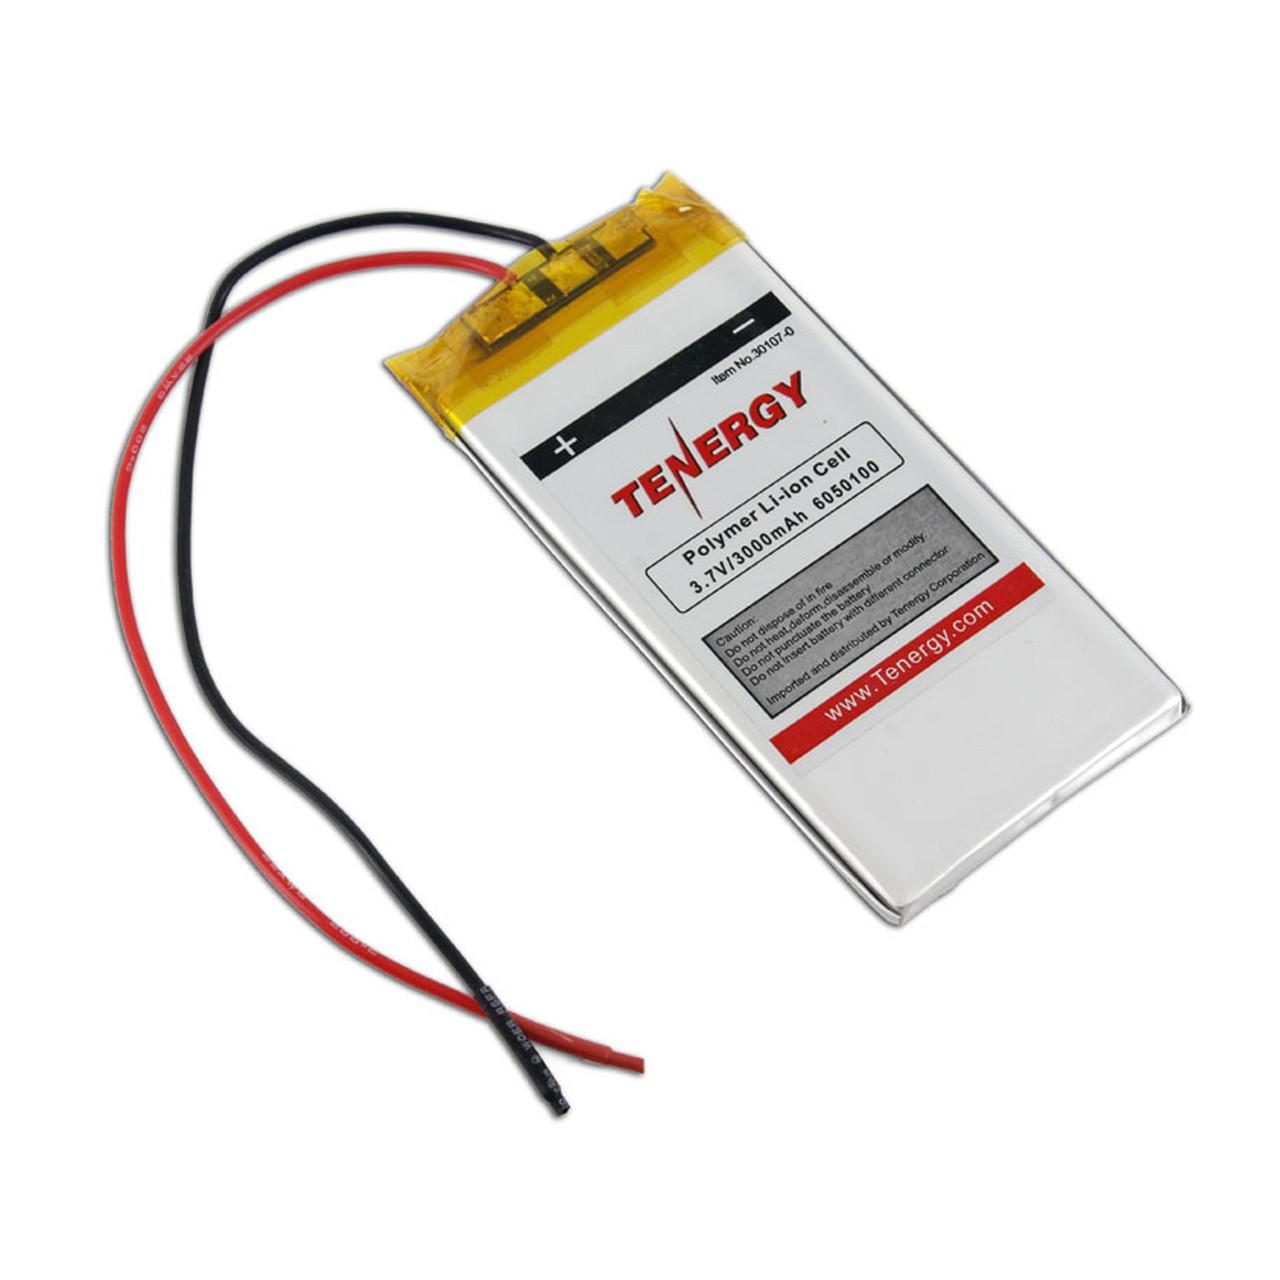 Tenergy Li-Polymer 3.7V 3000mAh (6050100) Battery